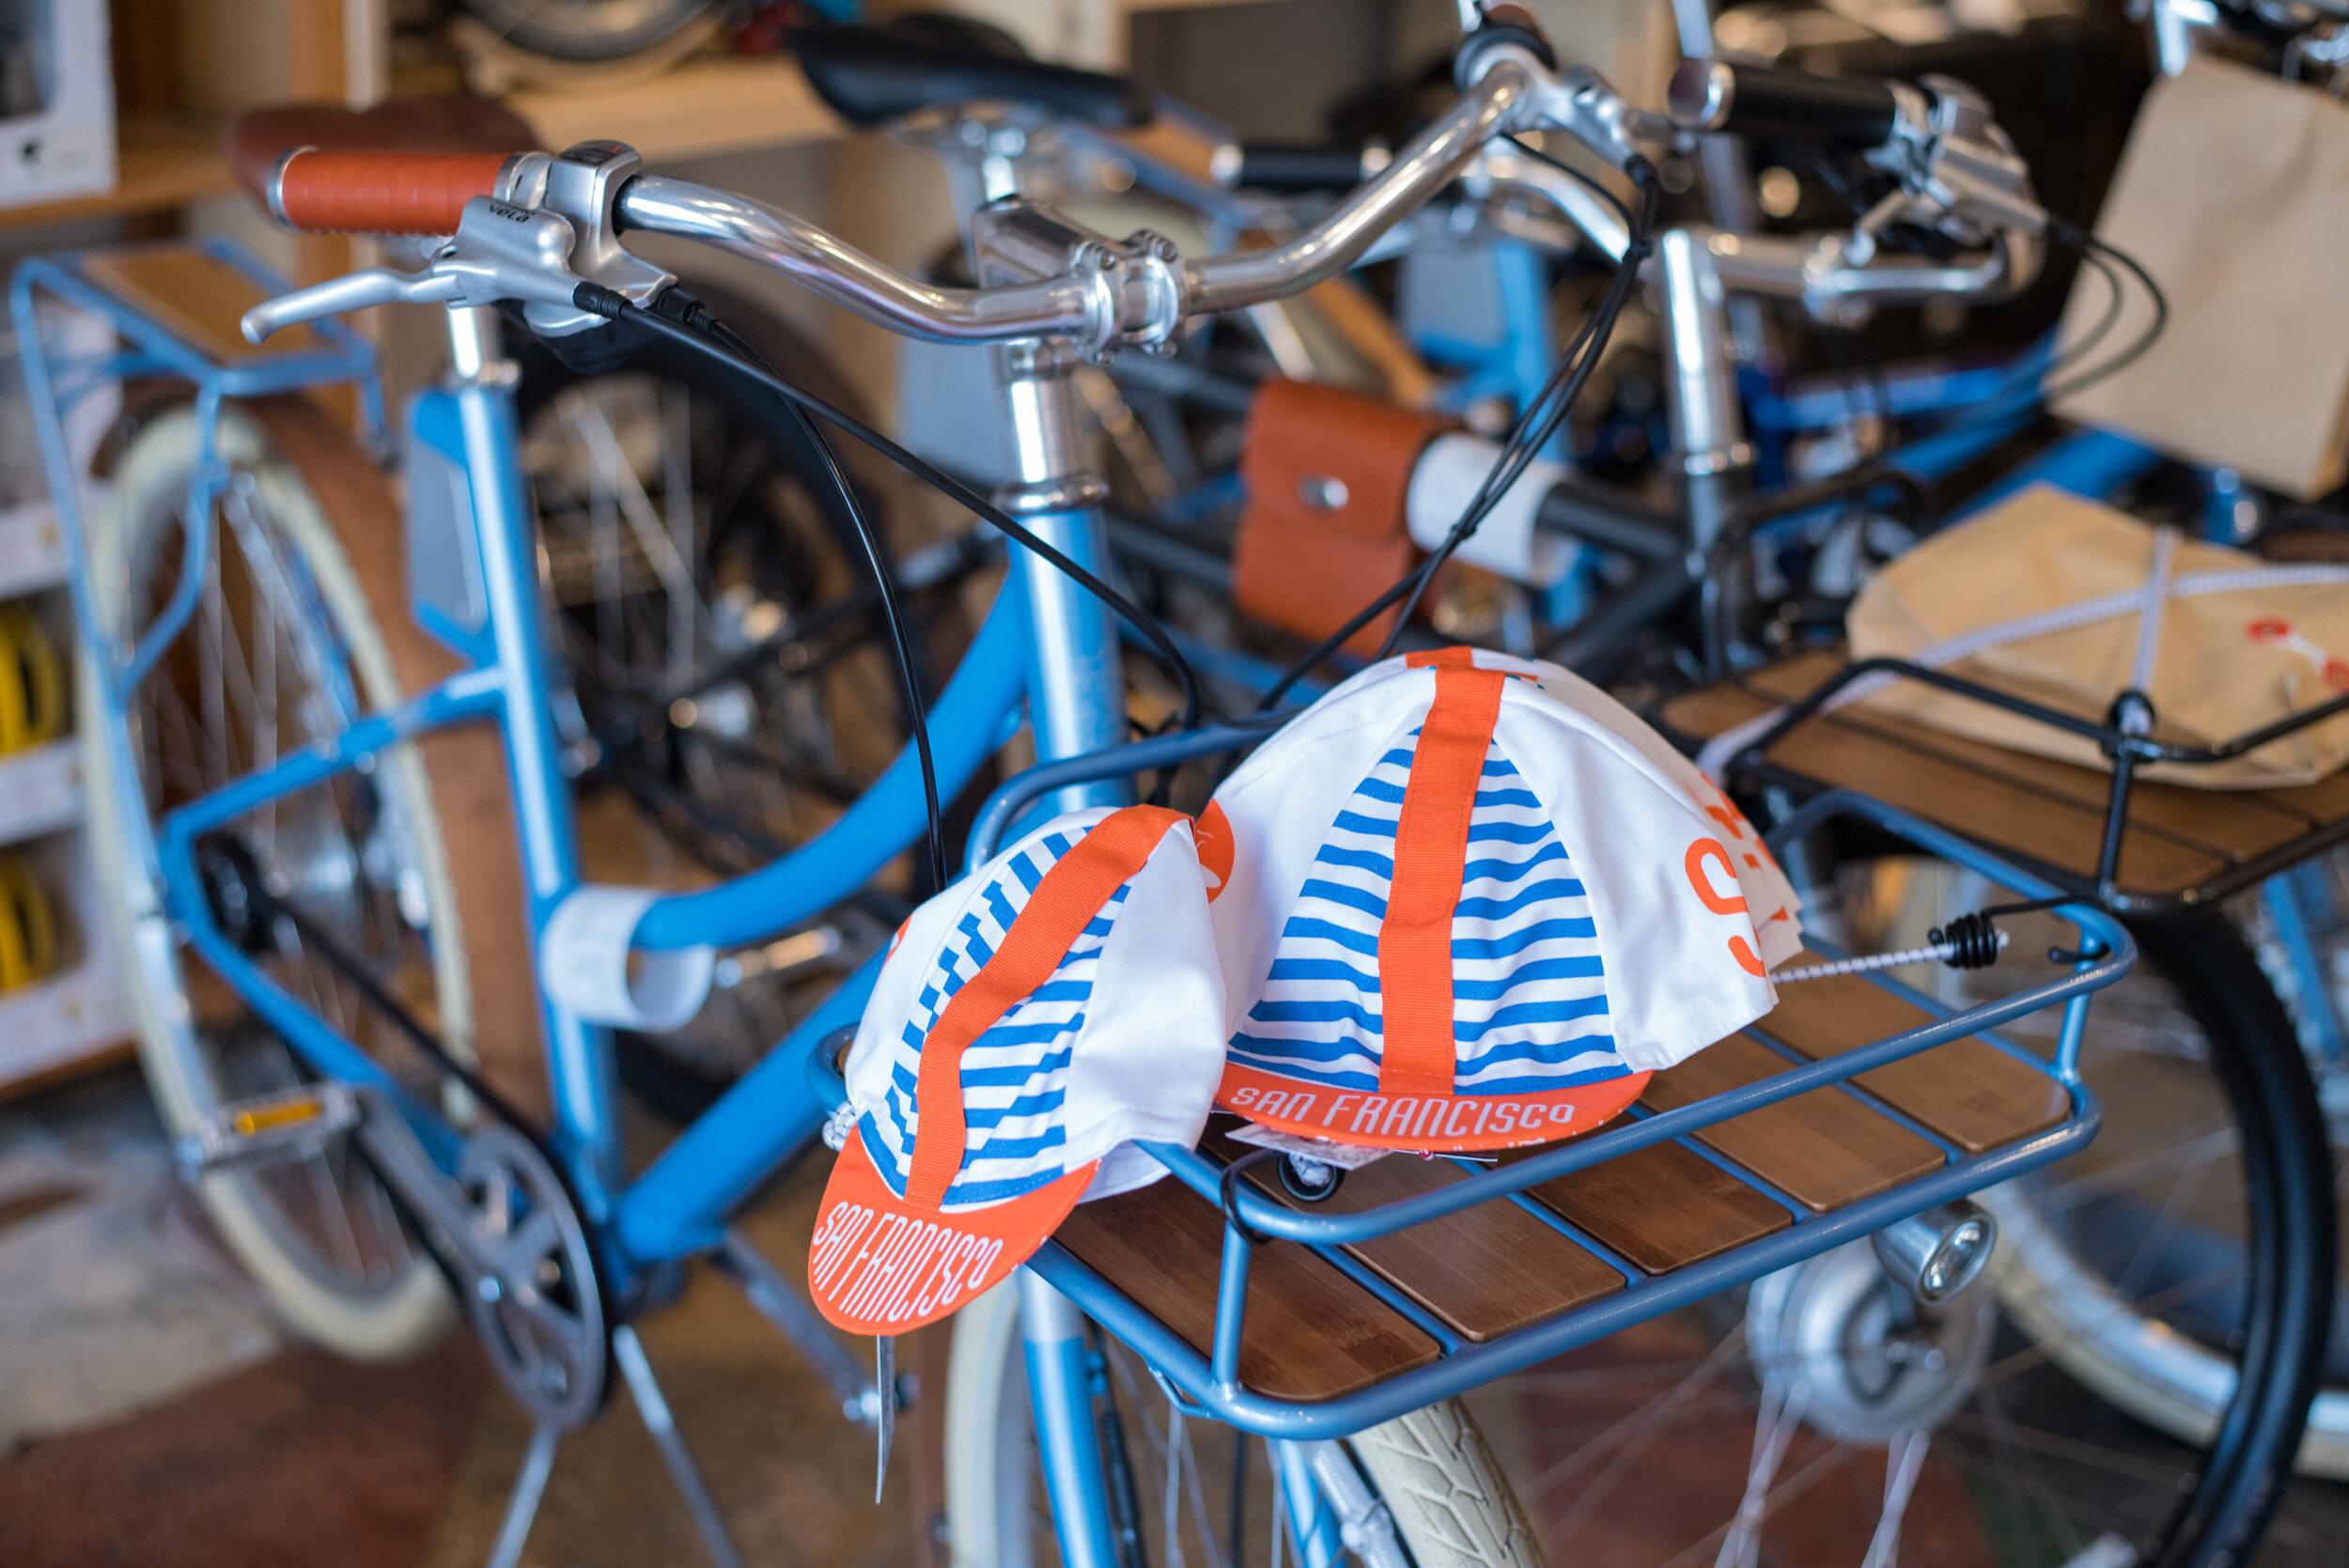 Biciamo_SanFrancisco_Bikes011.jpg